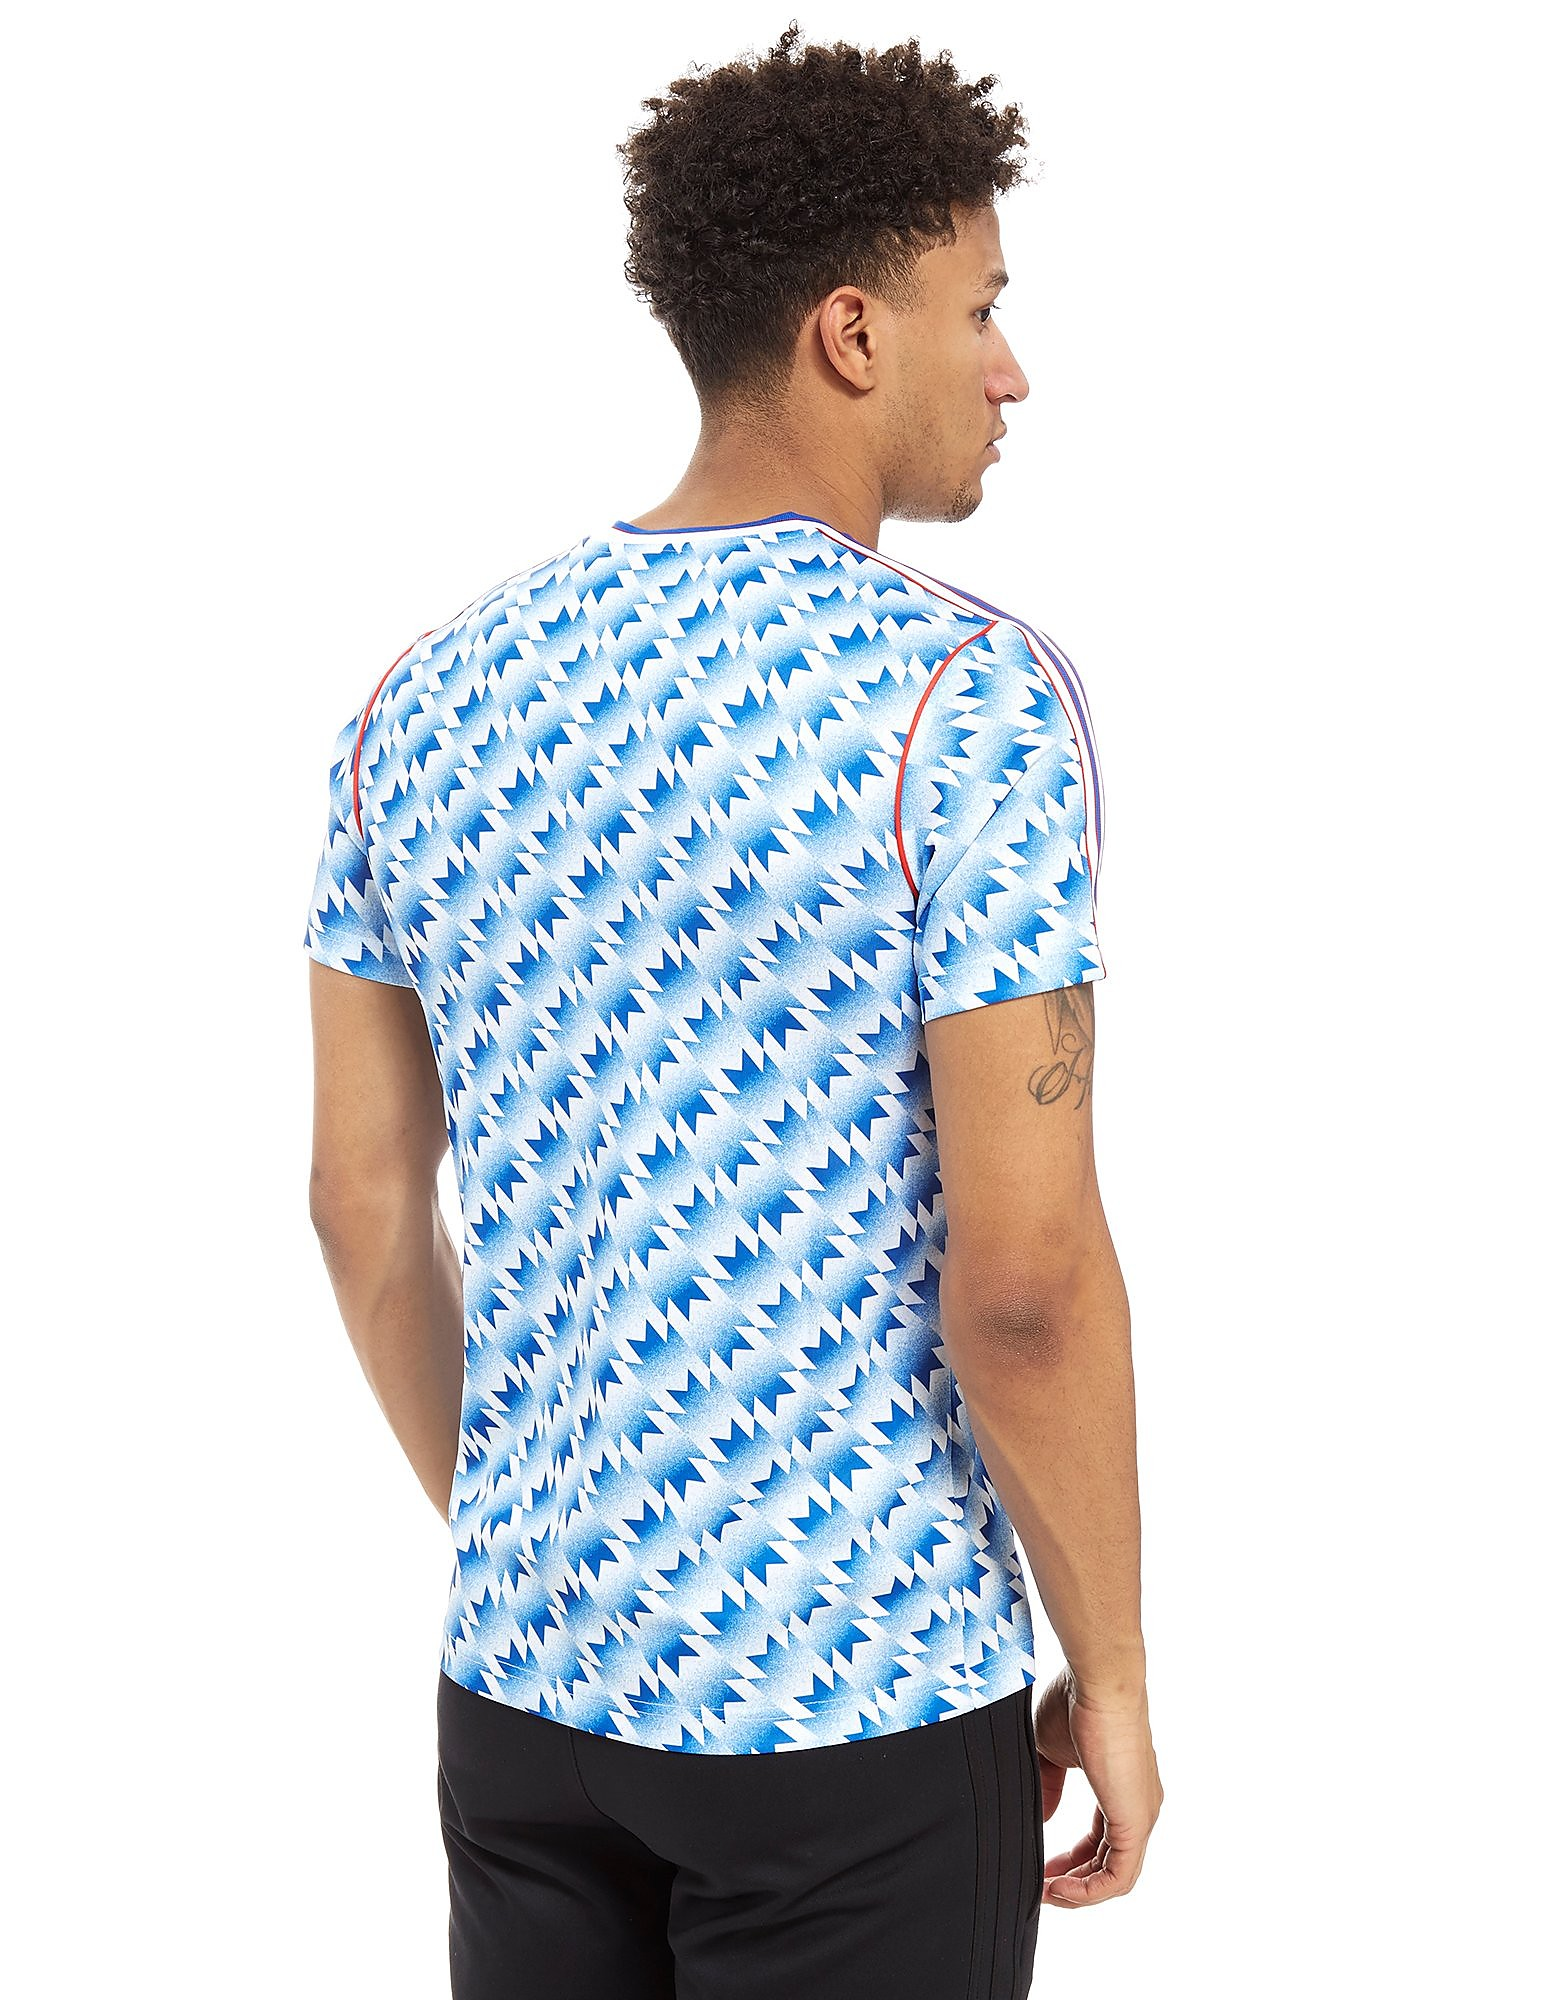 adidas Originals Manchester United Shirt